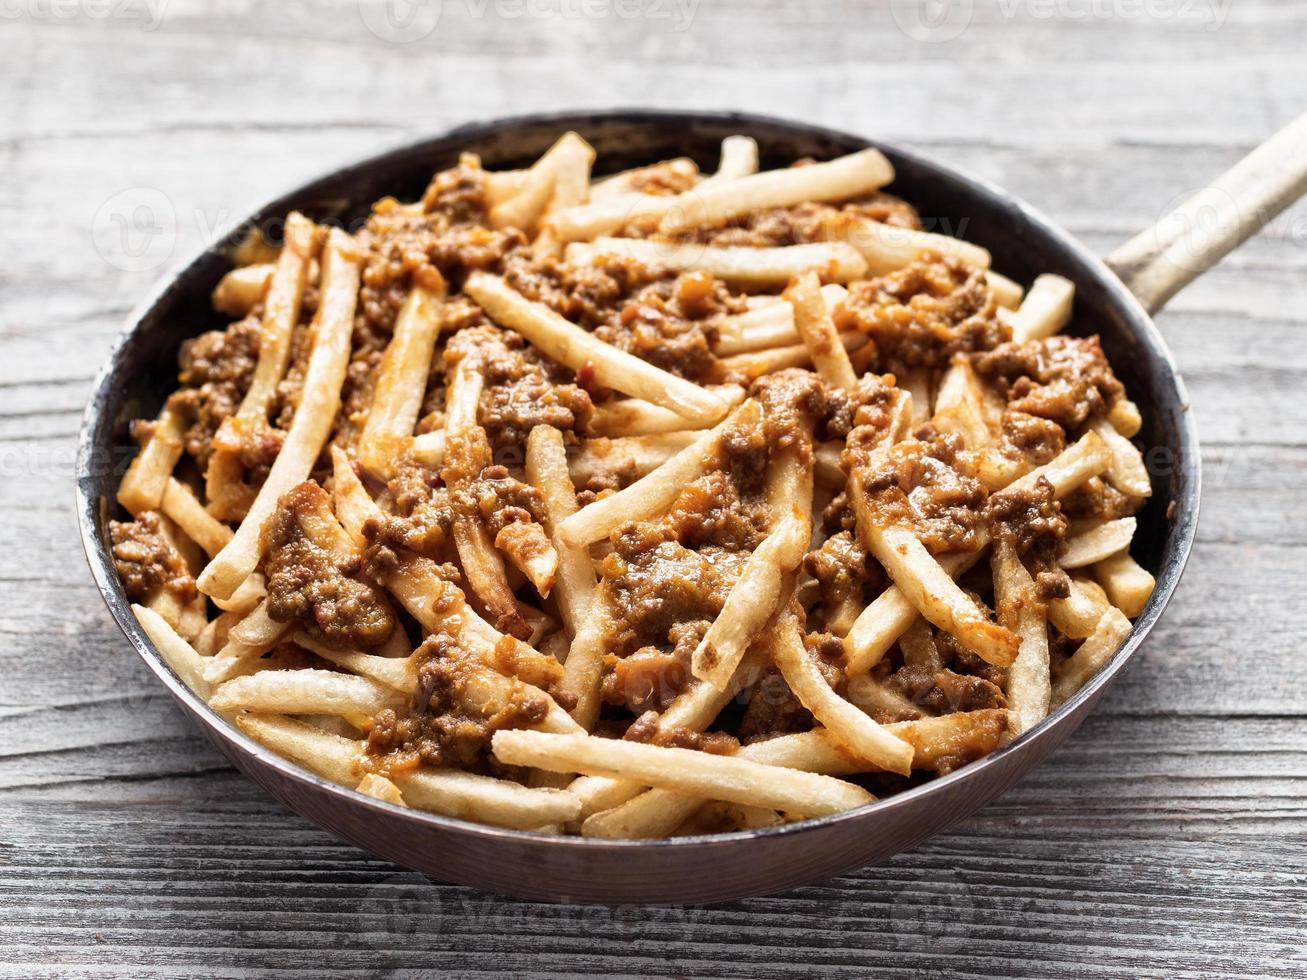 rustieke Amerikaanse chili frietjes foto